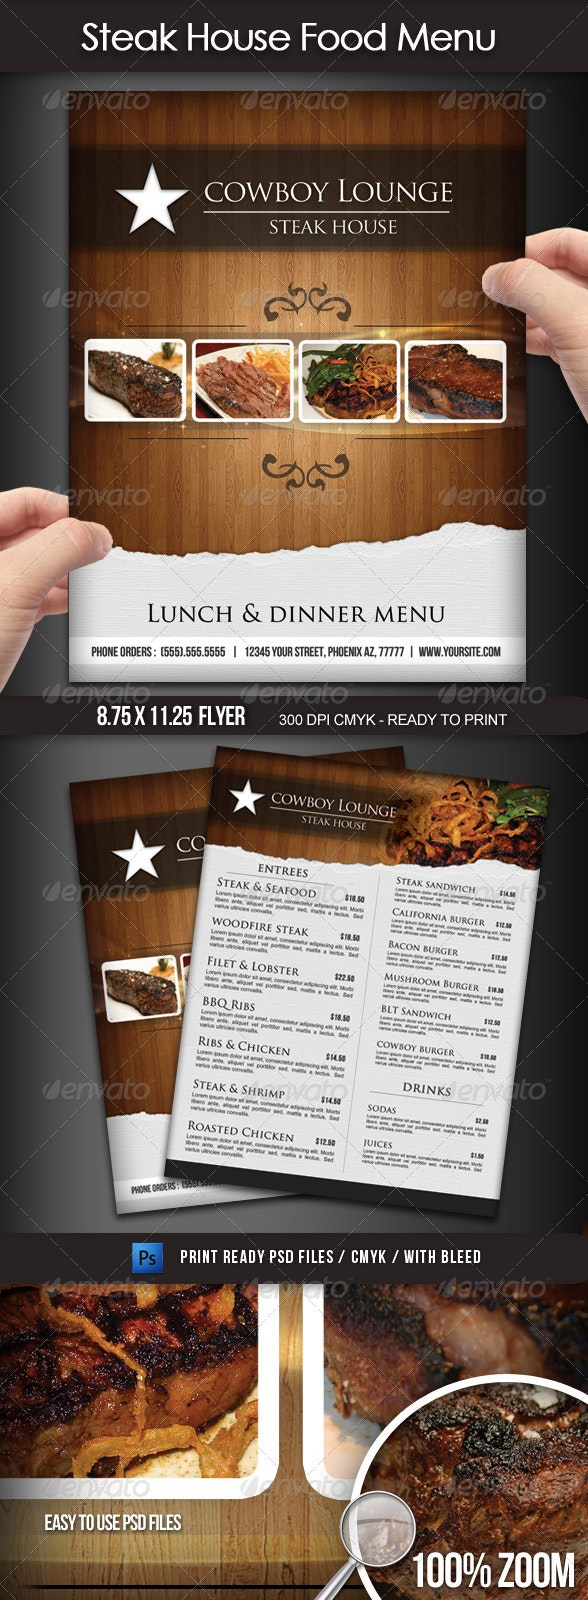 Steak House Menu Flyer - Restaurant Flyers